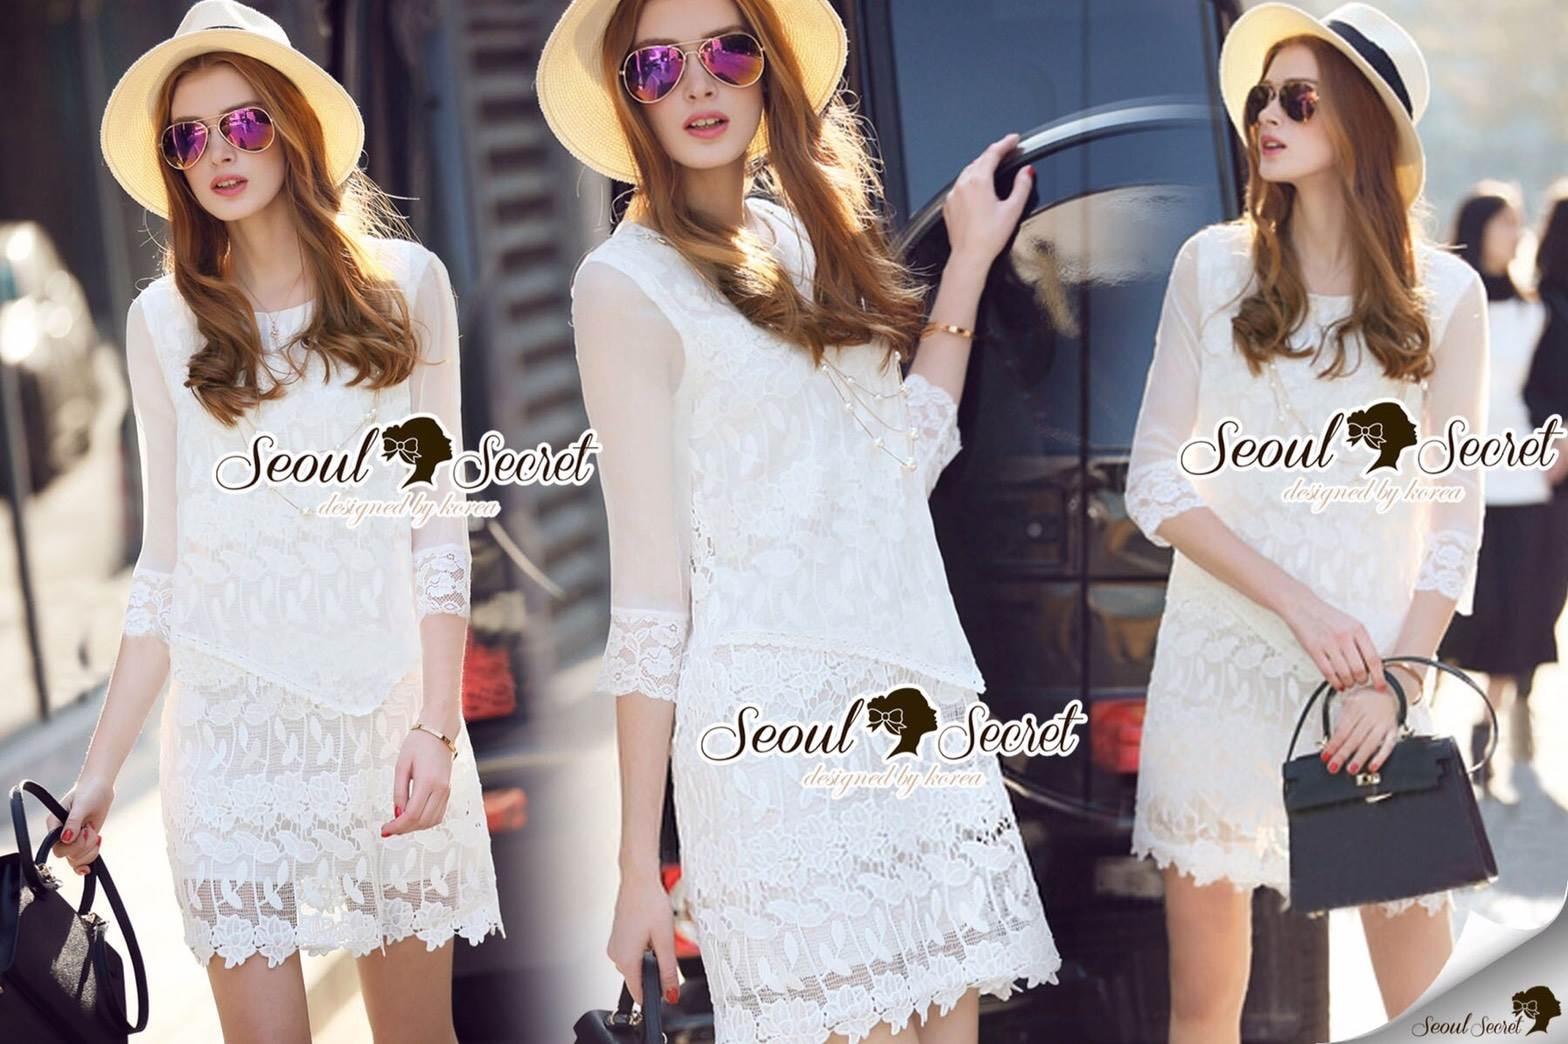 Seoul Secret Say's... Lollita Princess Lace Dress